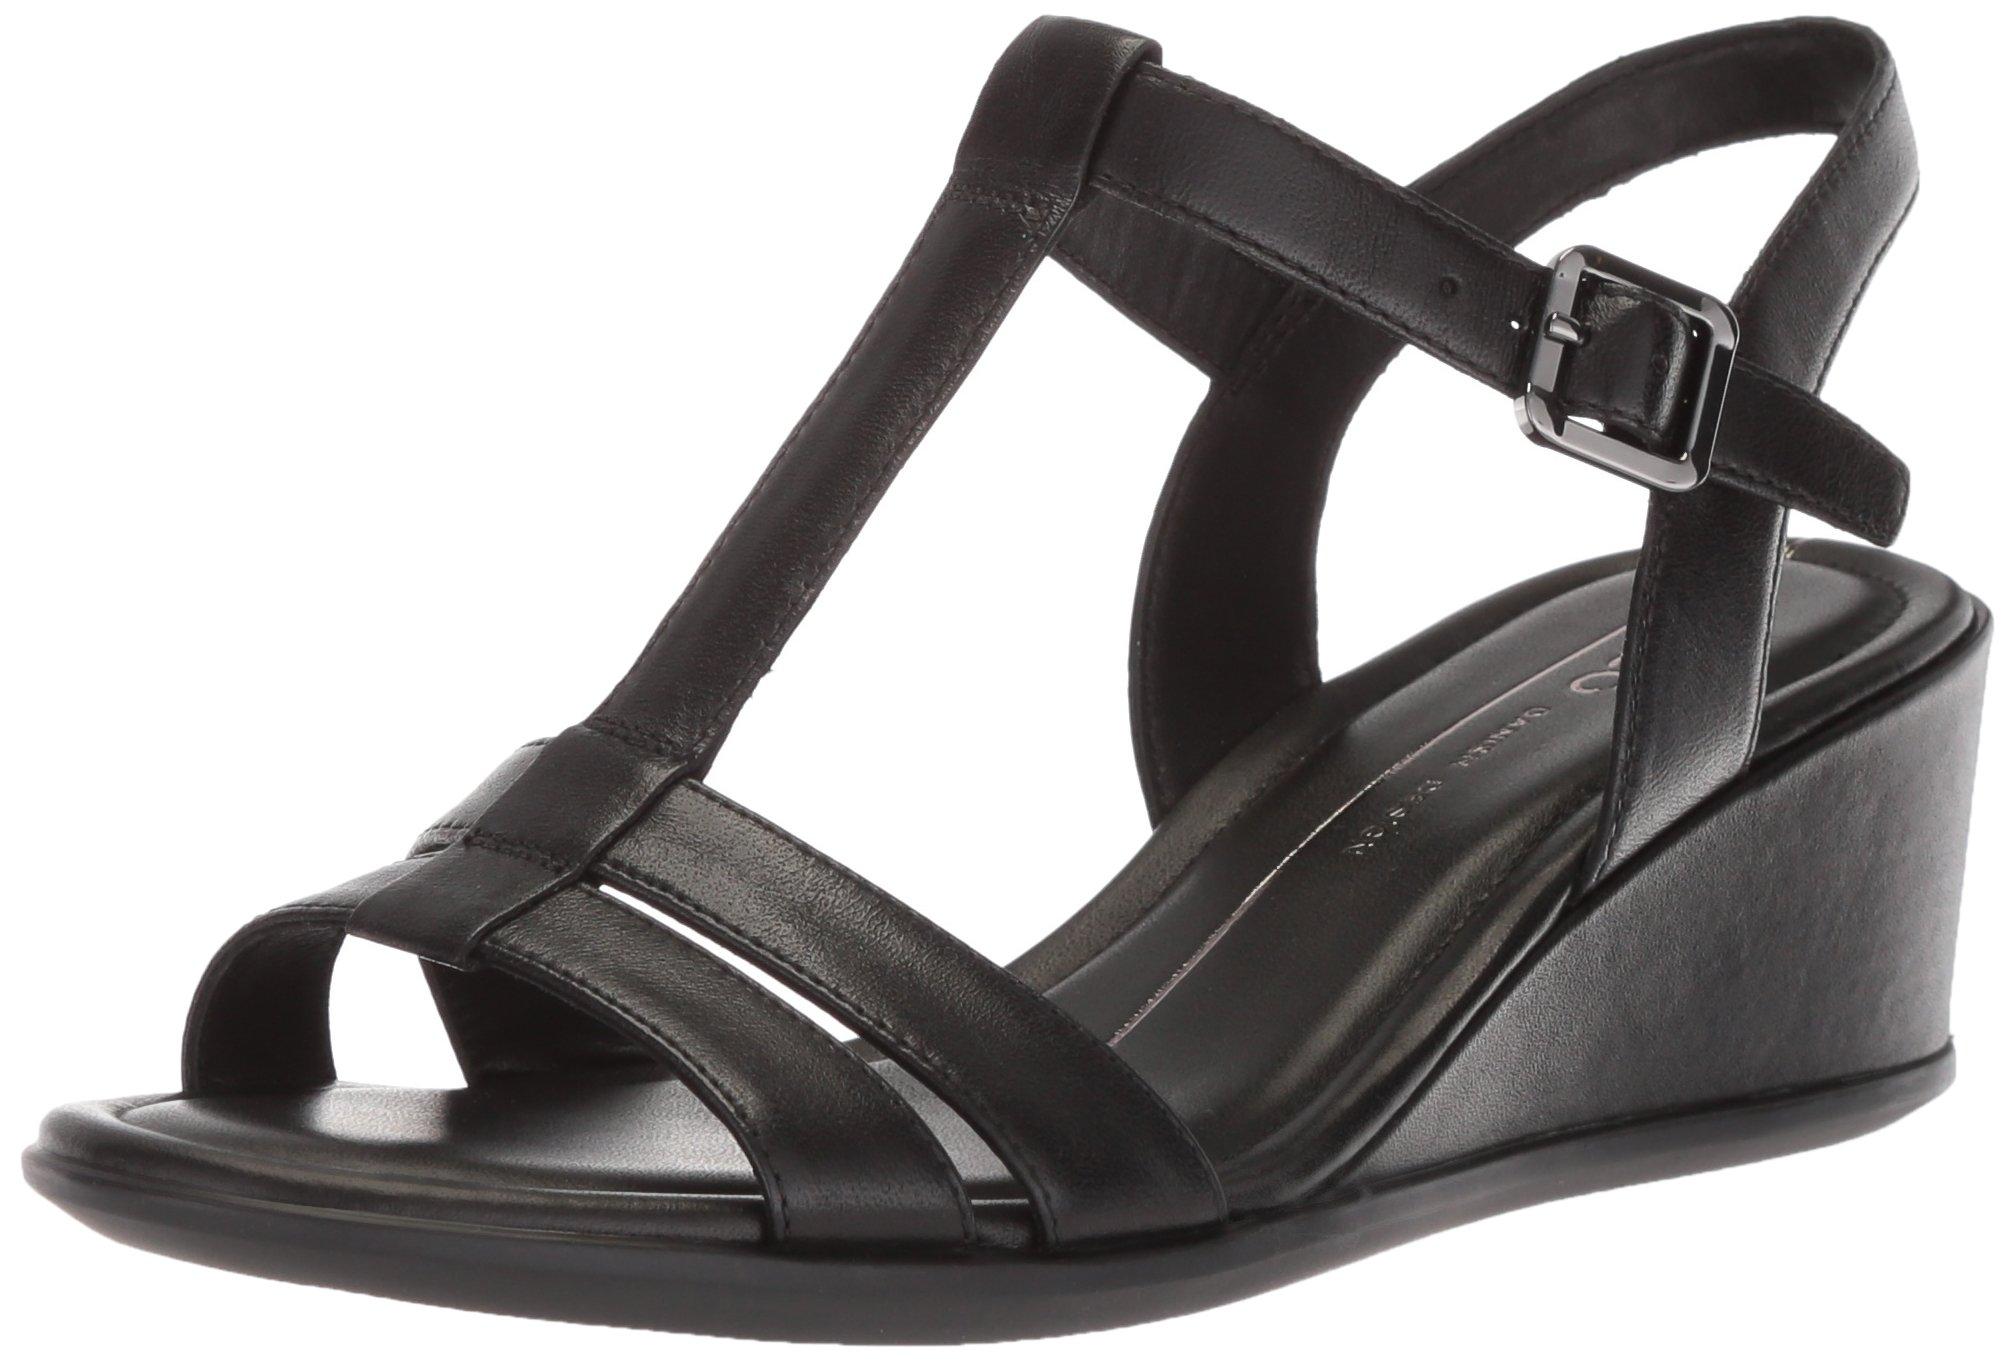 ECCO Women's Women's Shape 35 T-Strap Wedge Sandal, Black/Black, 37 M EU (6-6.5 US)